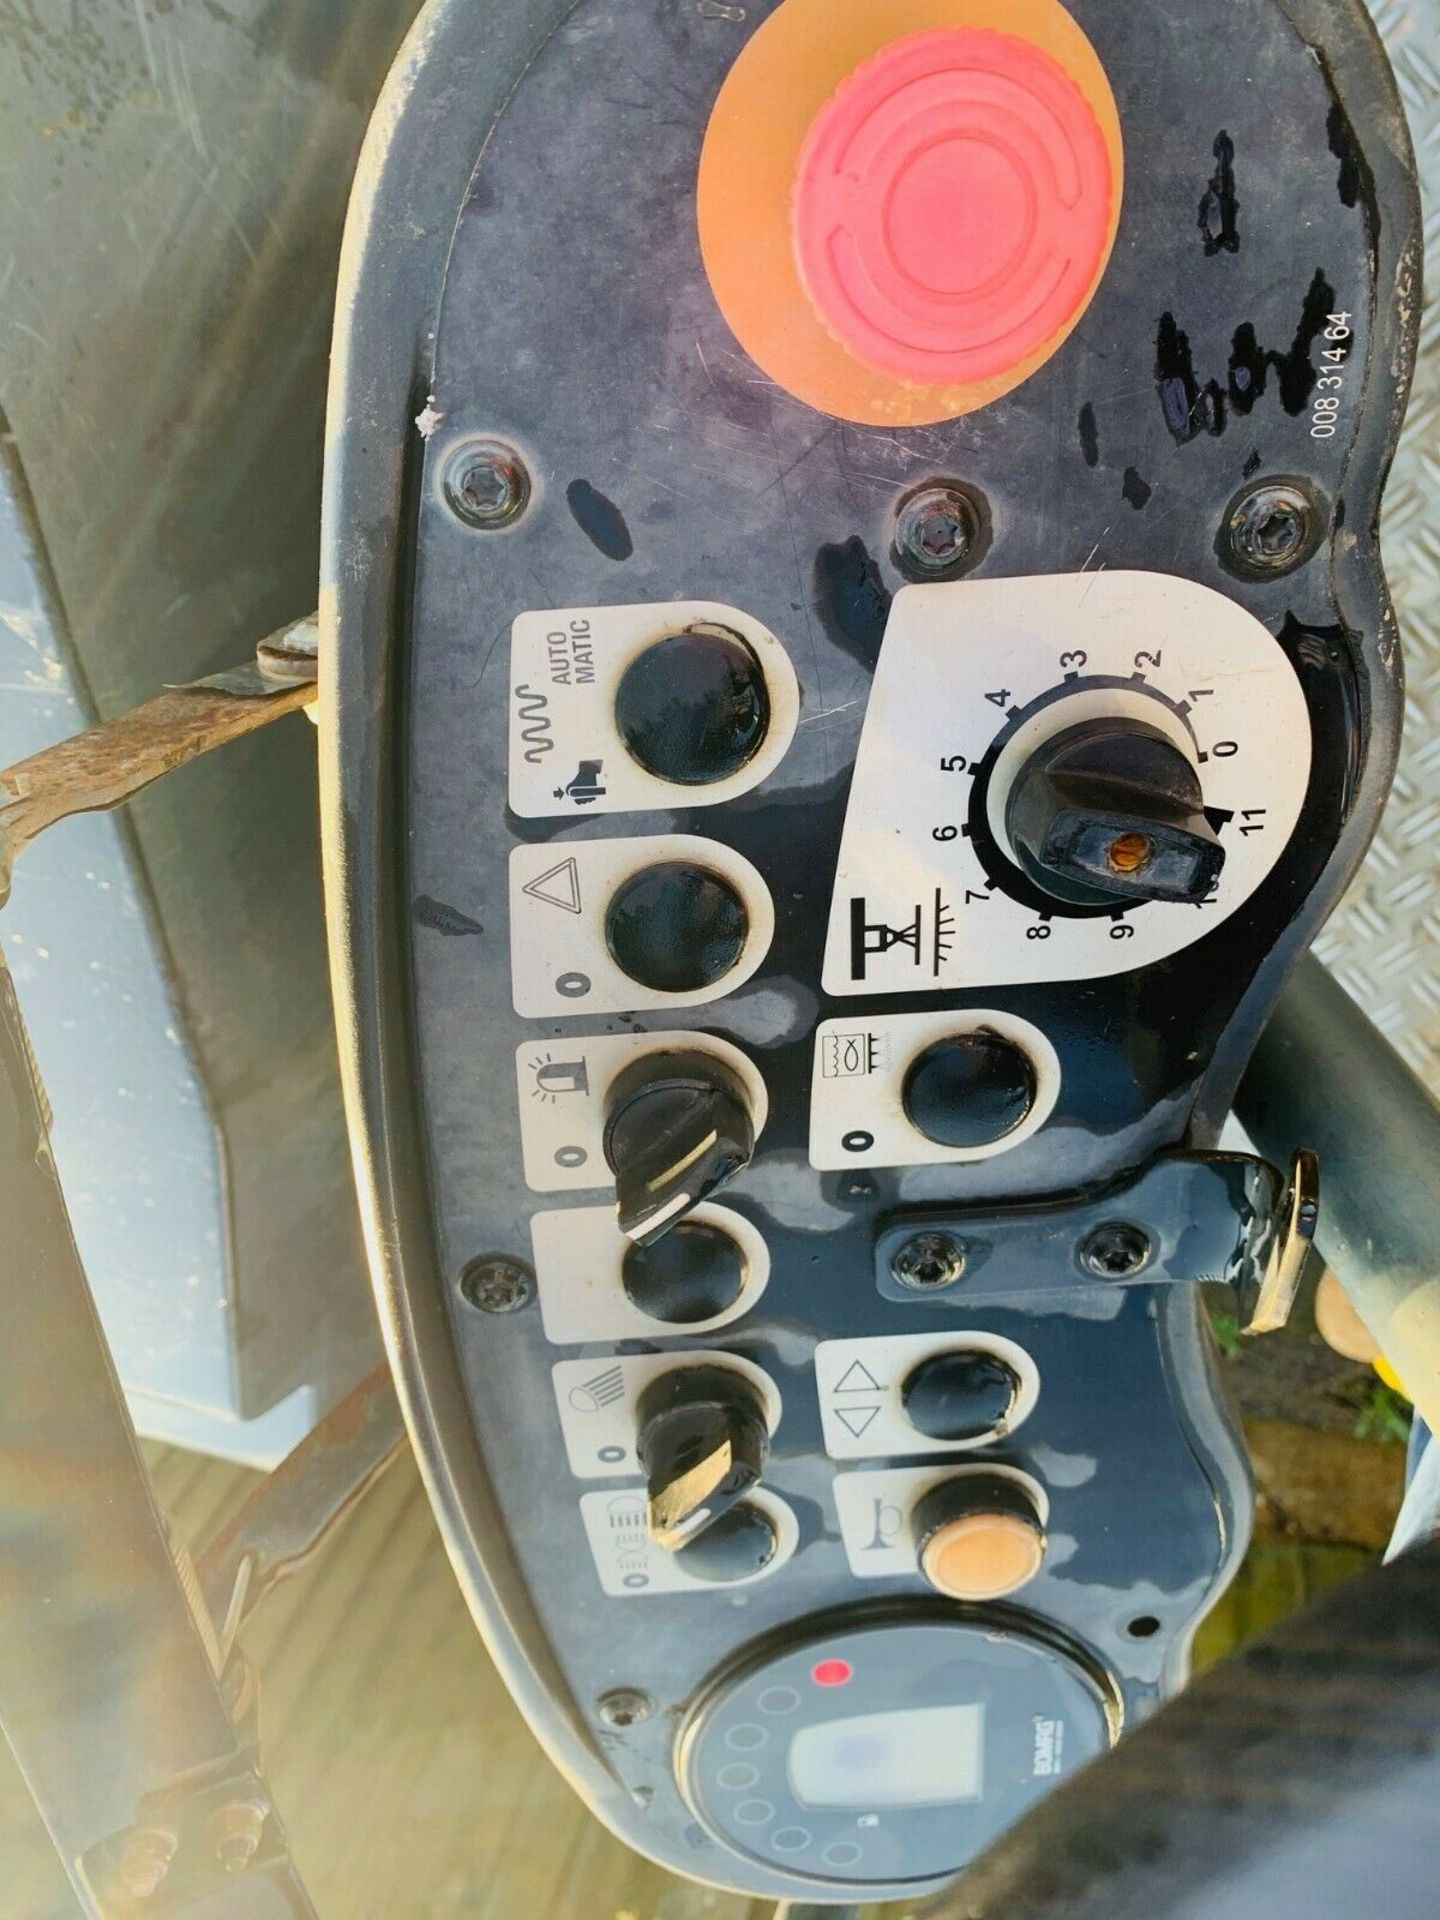 Lot 69 - Bomag BW 120 AD-4 Tandem Roller